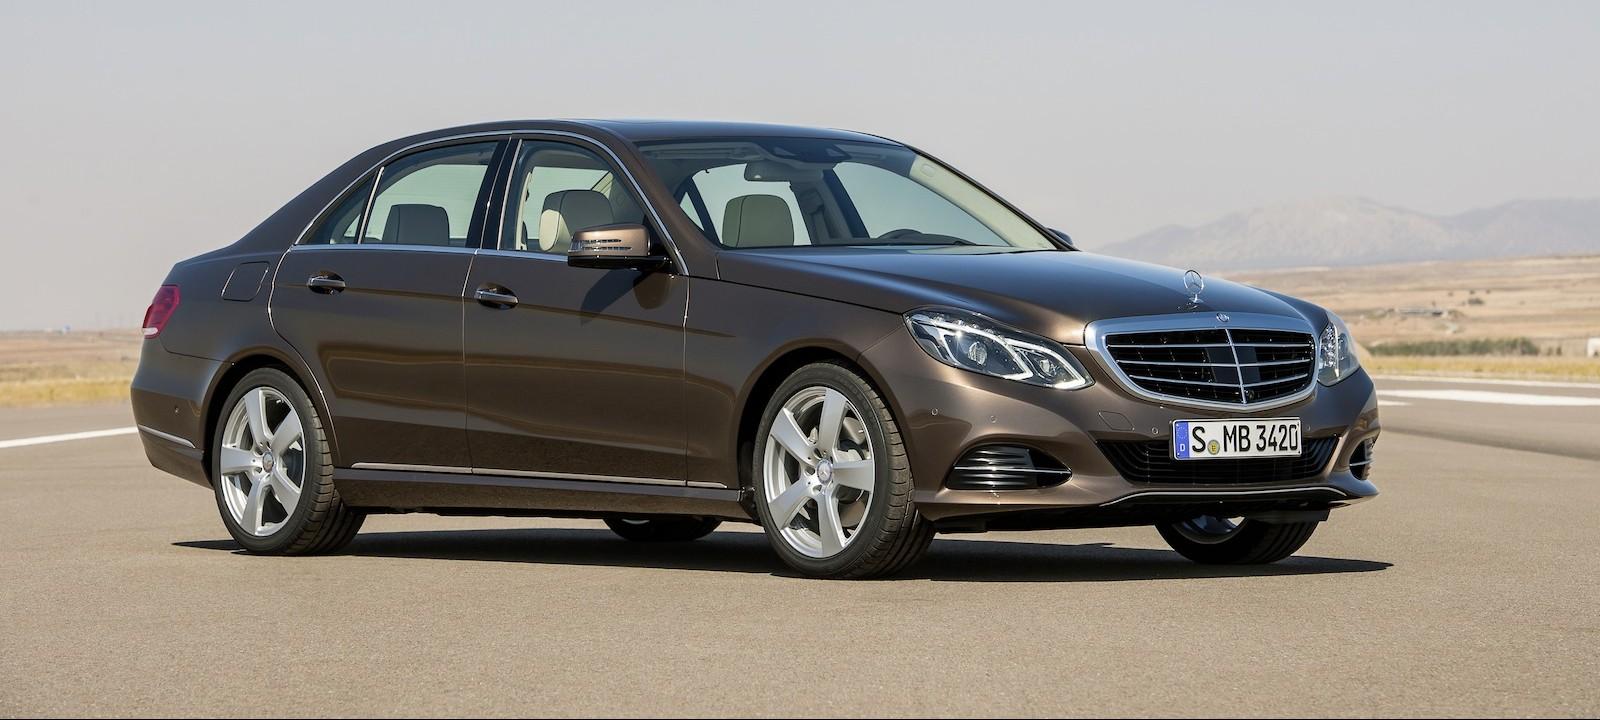 2013 mercedes benz e class review caradvice for Mercedes benz e class 2013 price